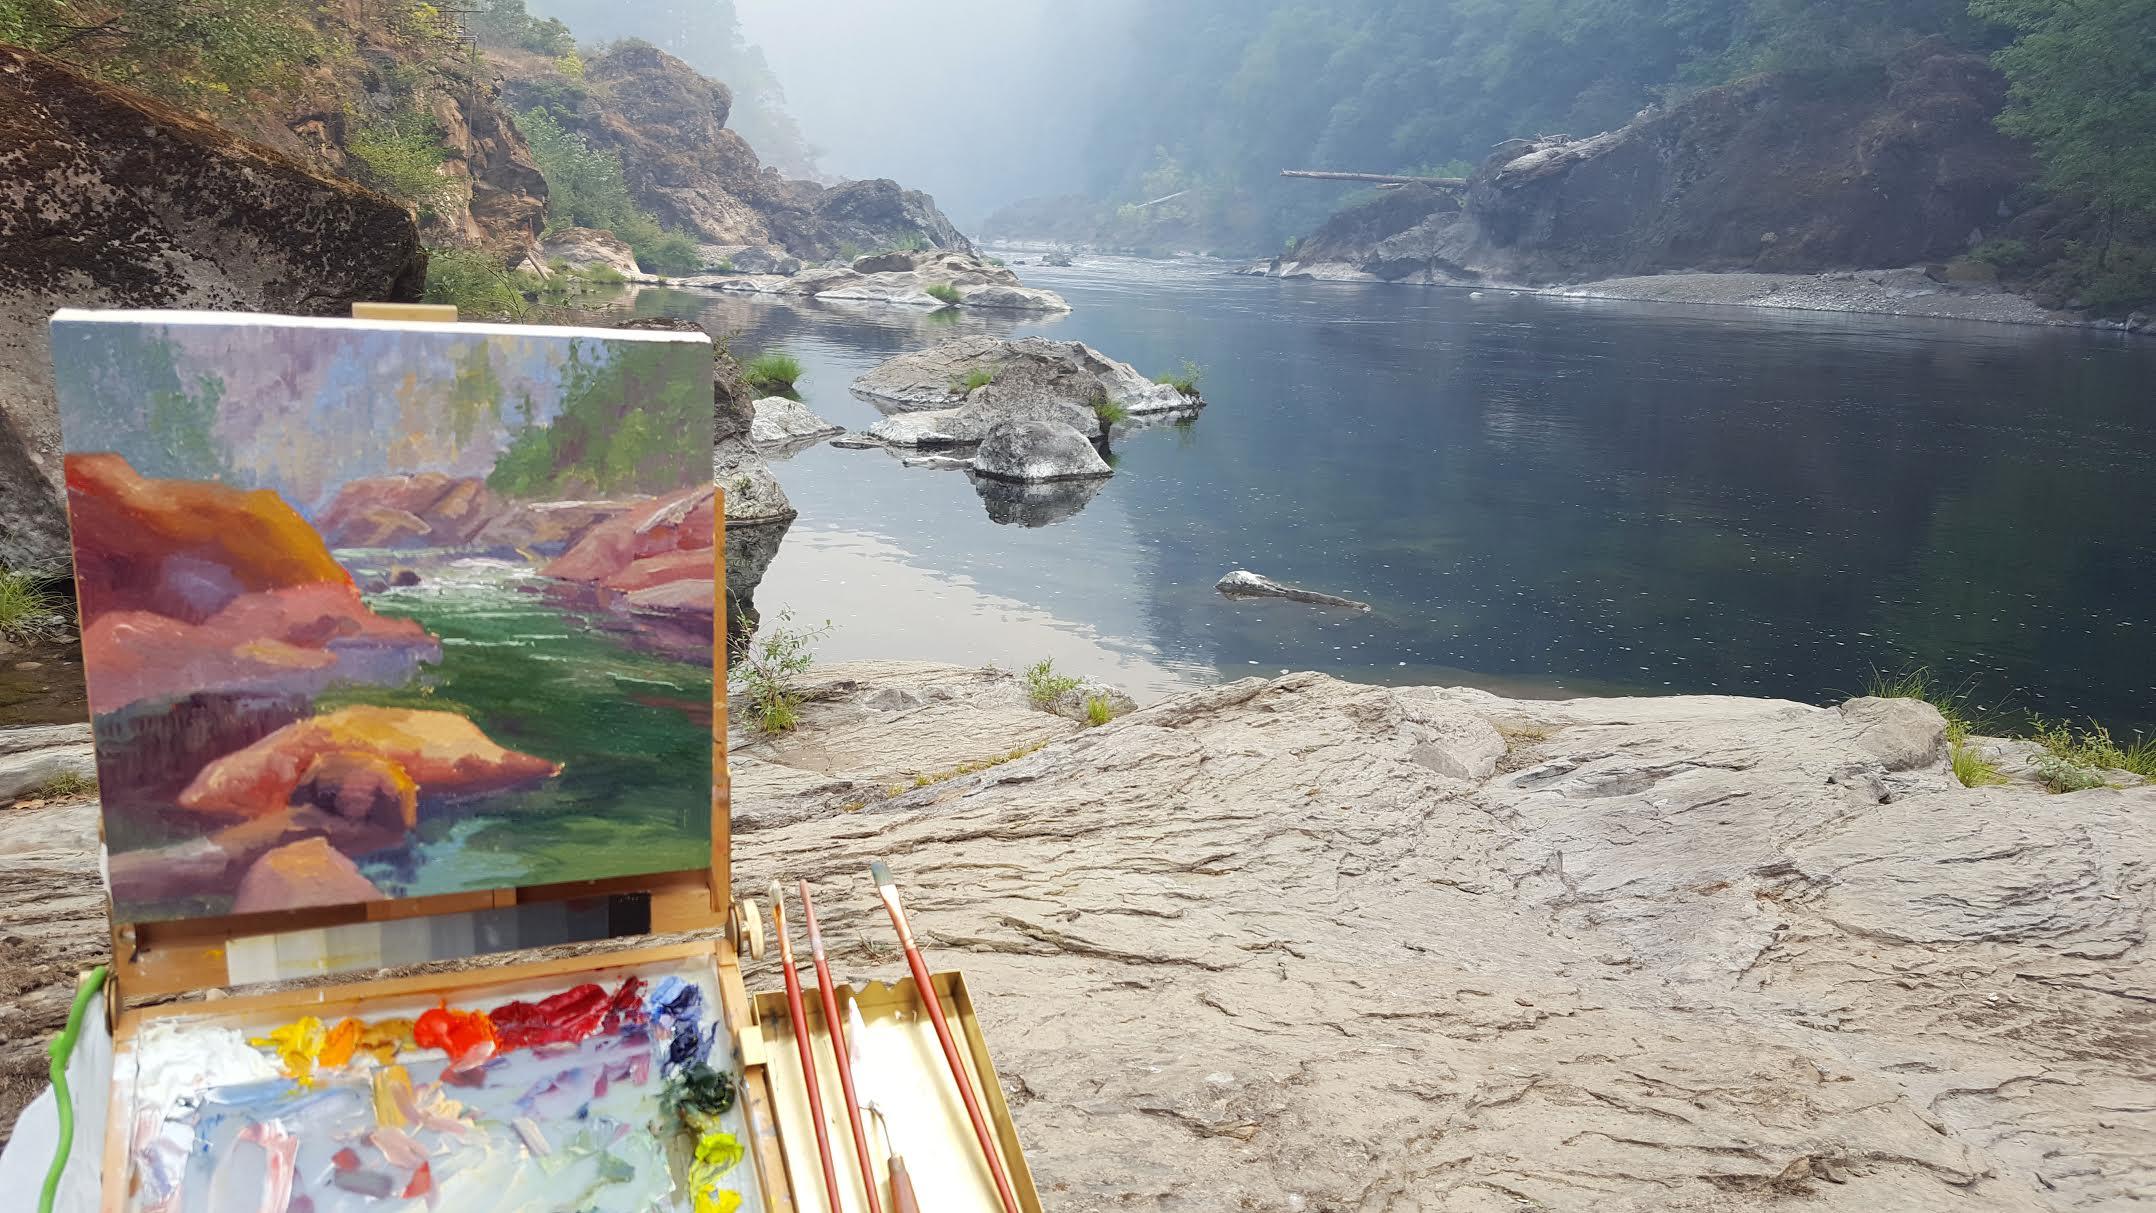 Karen E. Lewis'  painting and materials at the Umpaqua En Plein Air competition